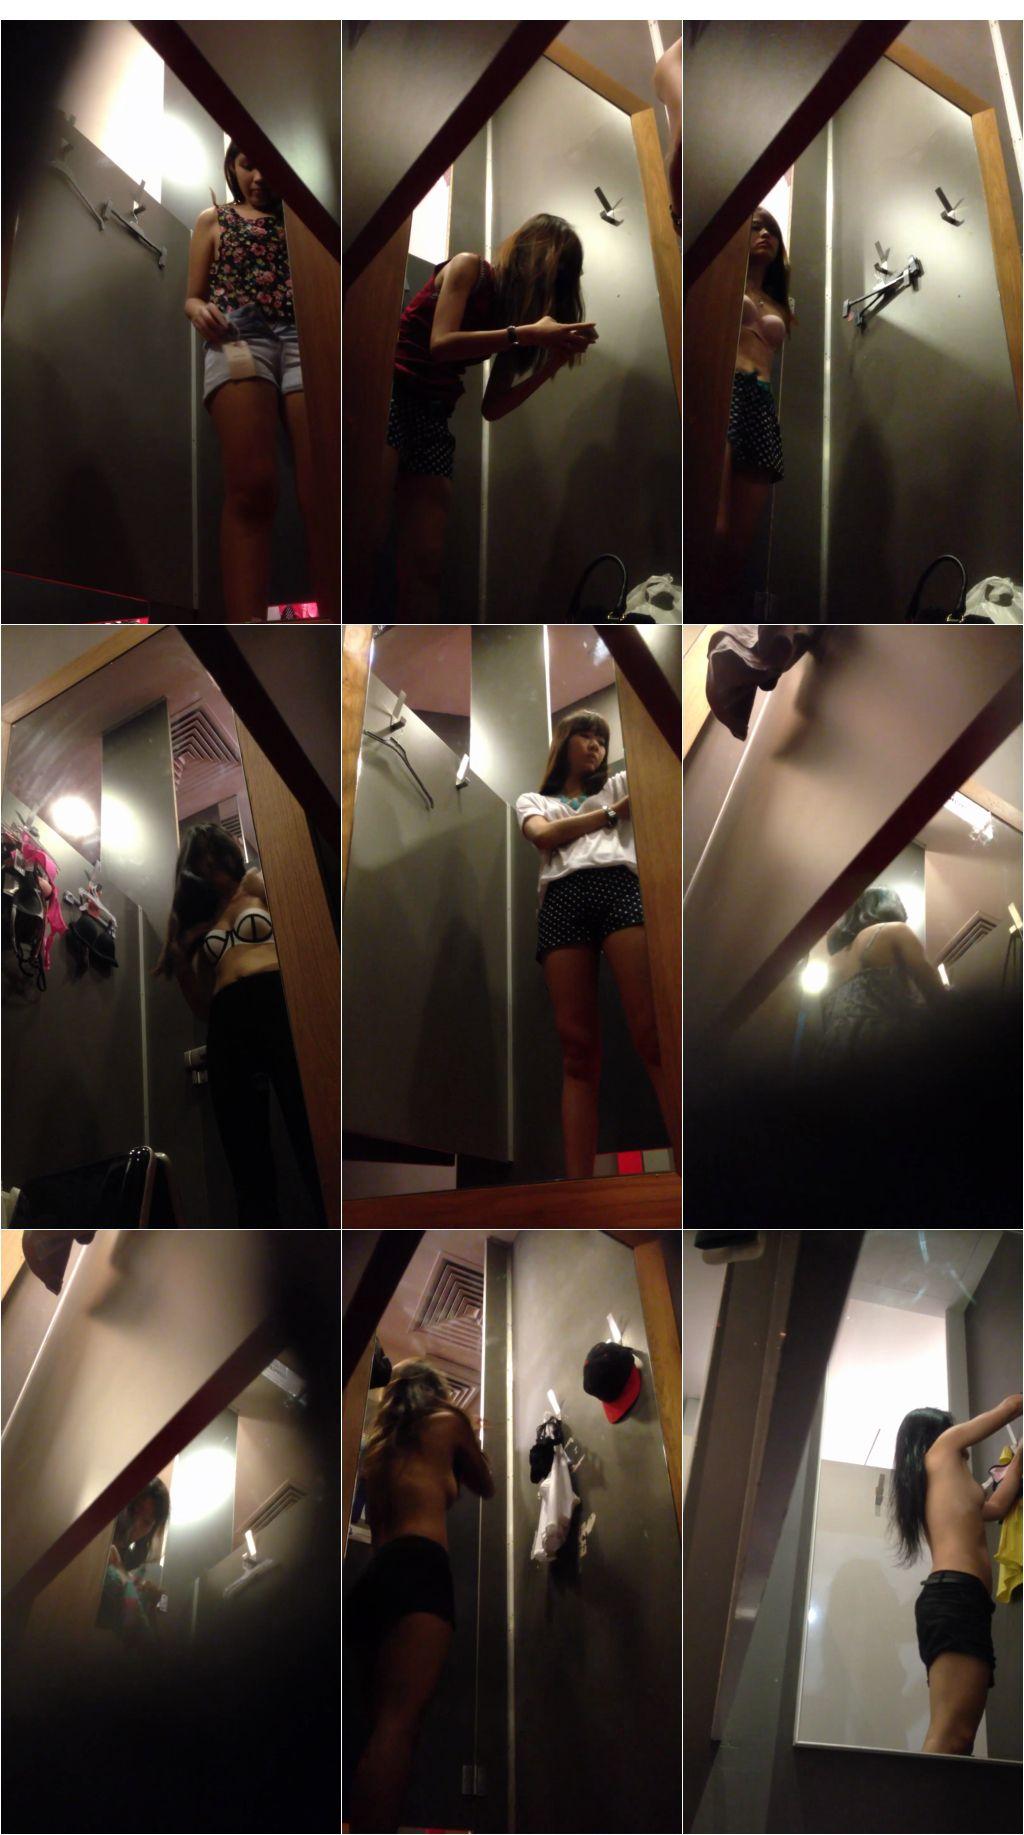 http://amazing-av.com/IMG/Asian_changing_room_1.jpeg